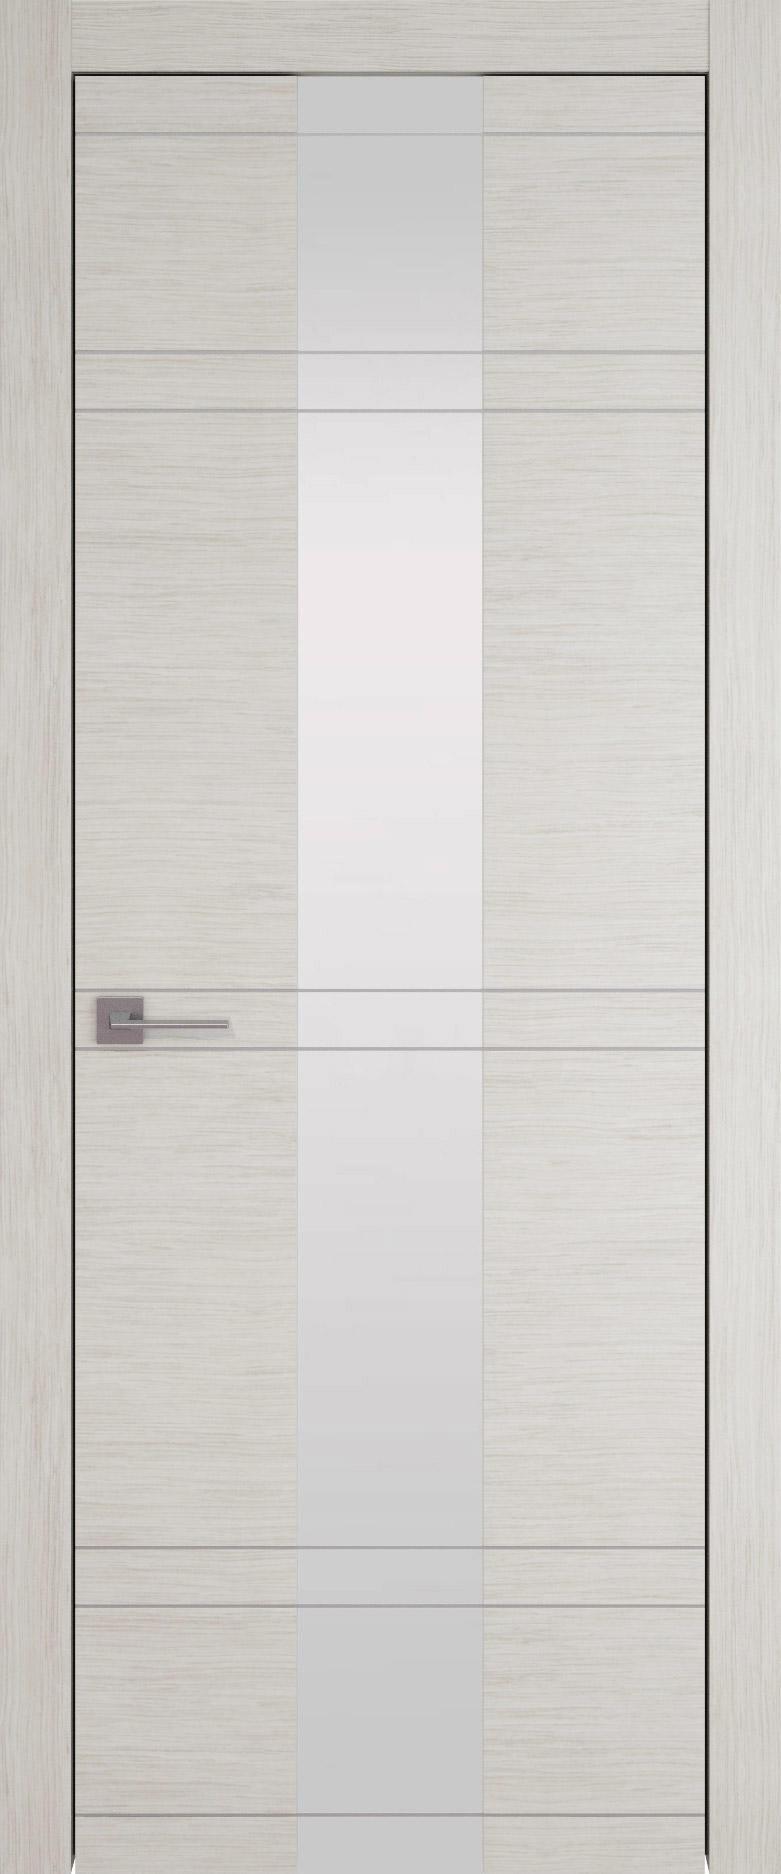 Tivoli Ж-4 цвет - Дымчатый дуб Со стеклом (ДО)